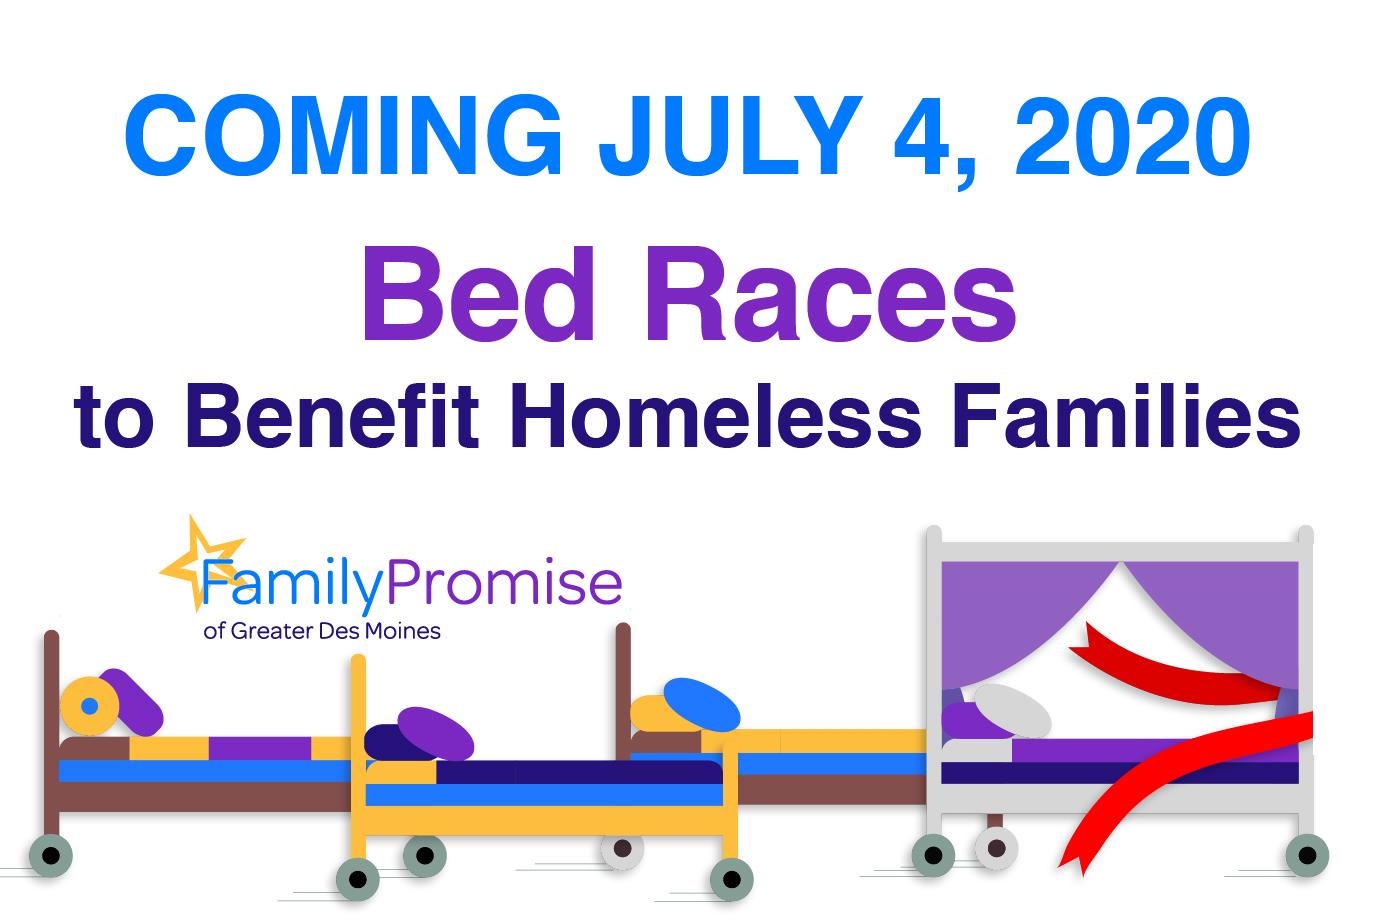 FPGD Bed Races